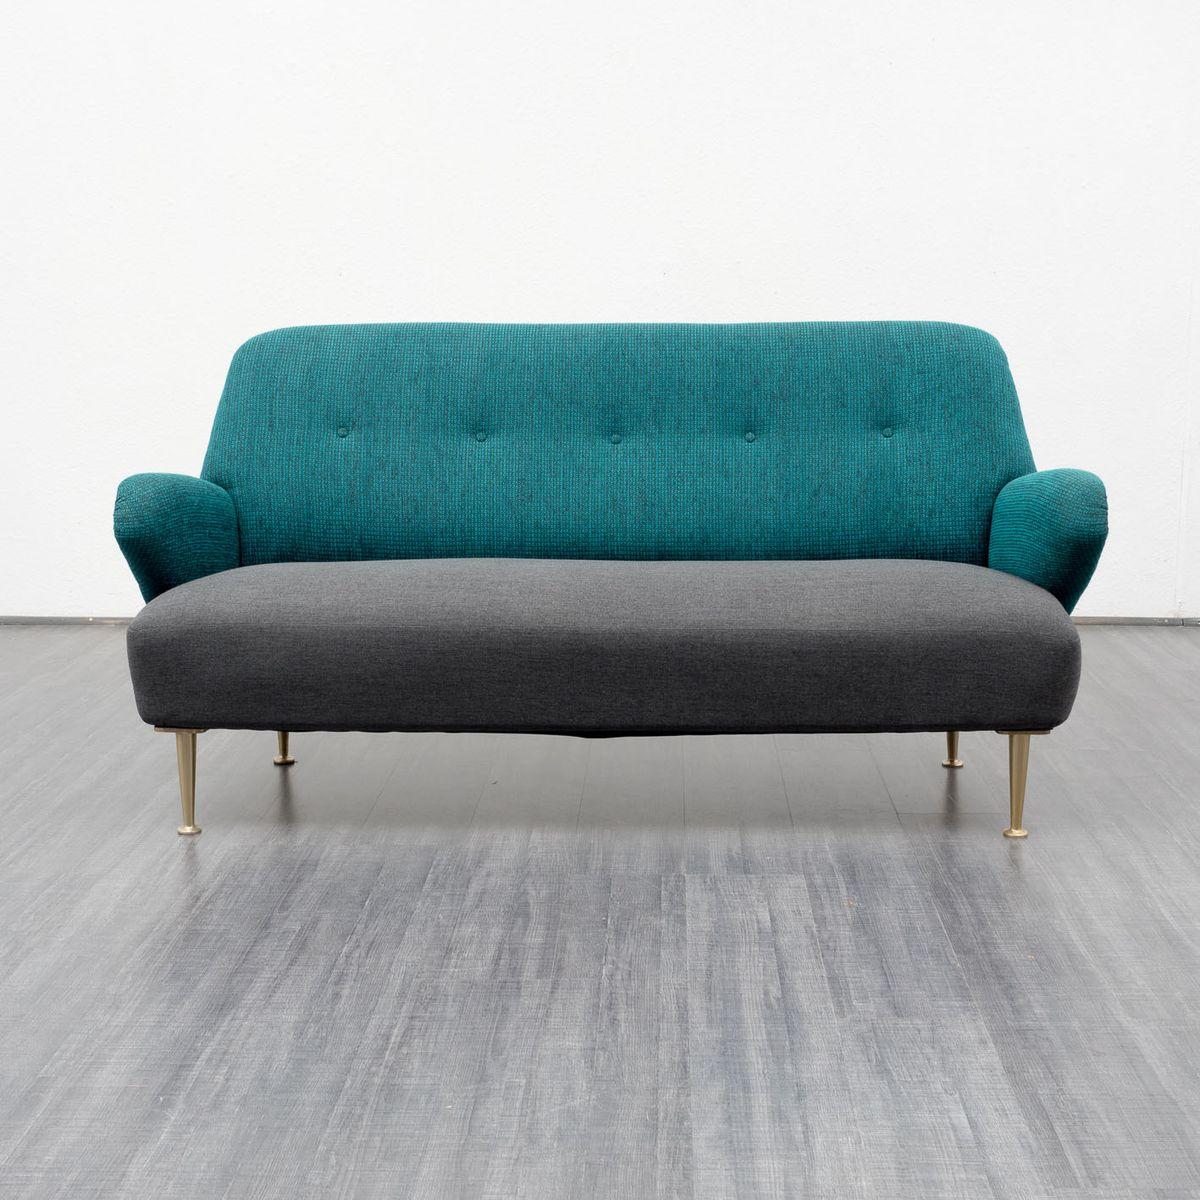 antike sofas kaufen for sale sydney used sofa wohnzimmer. Black Bedroom Furniture Sets. Home Design Ideas